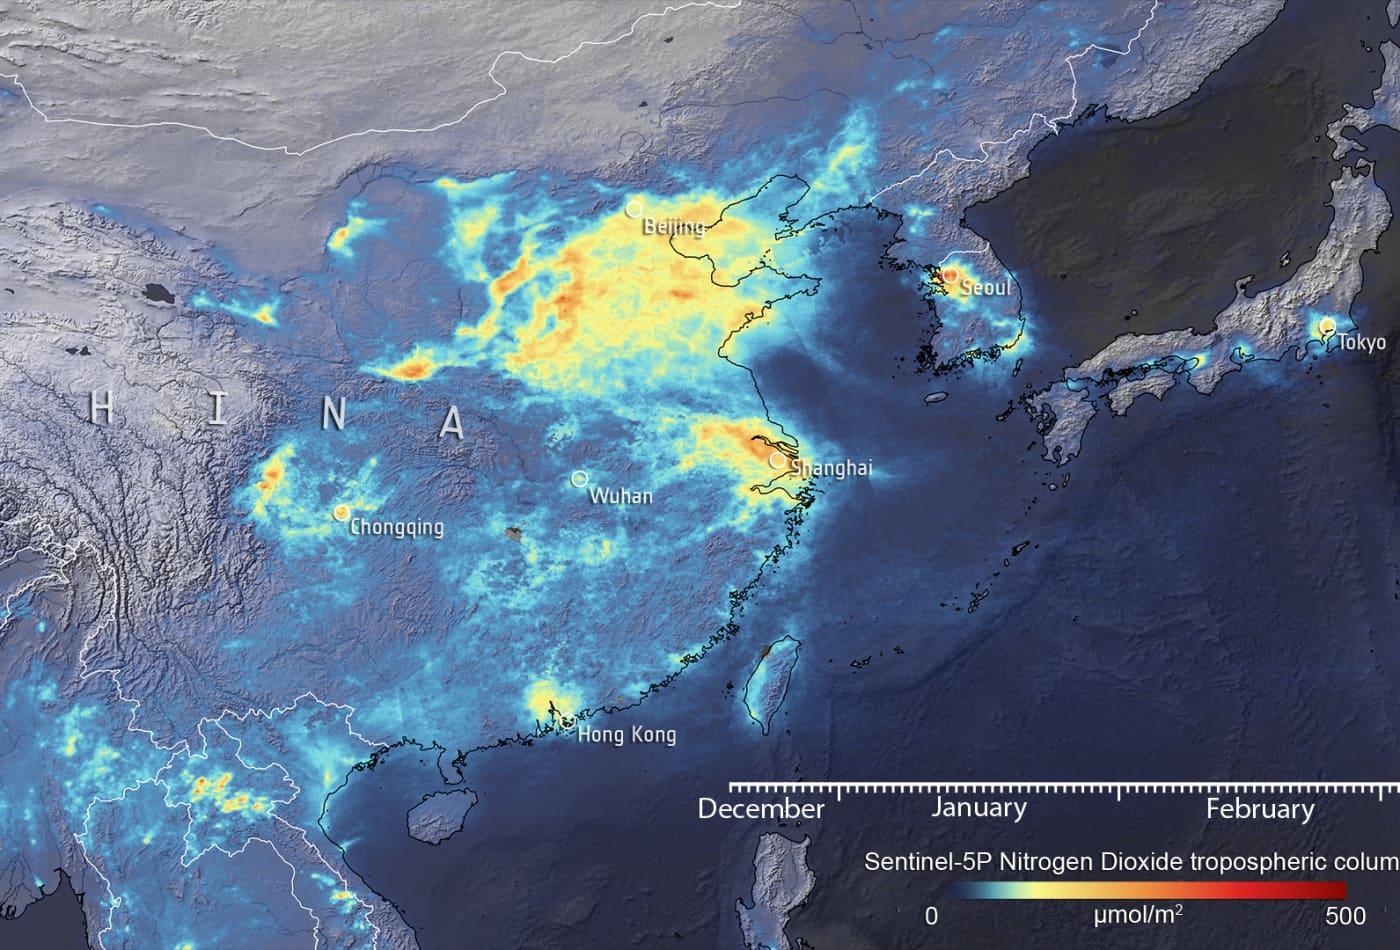 Coronavirus quarantines lead to massive drop in air pollution